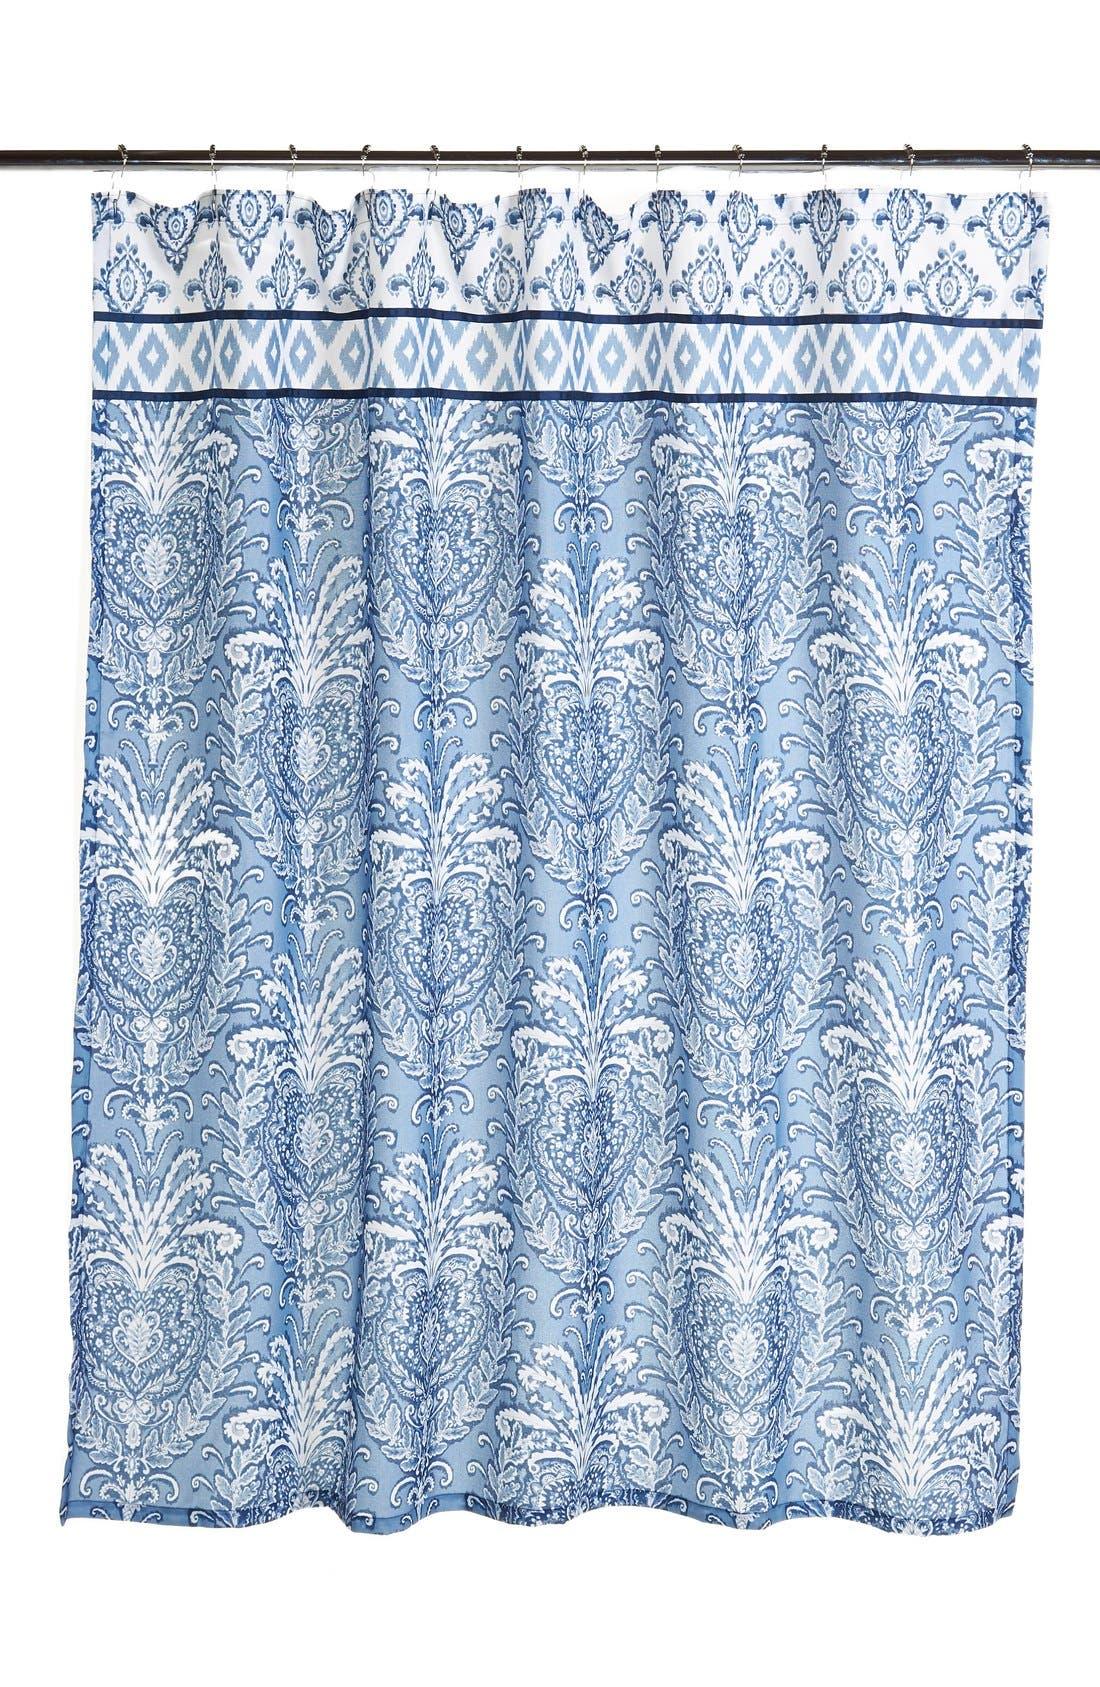 Alternate Image 1 Selected - Dena Home 'Madison' Ikat Print Shower Curtain